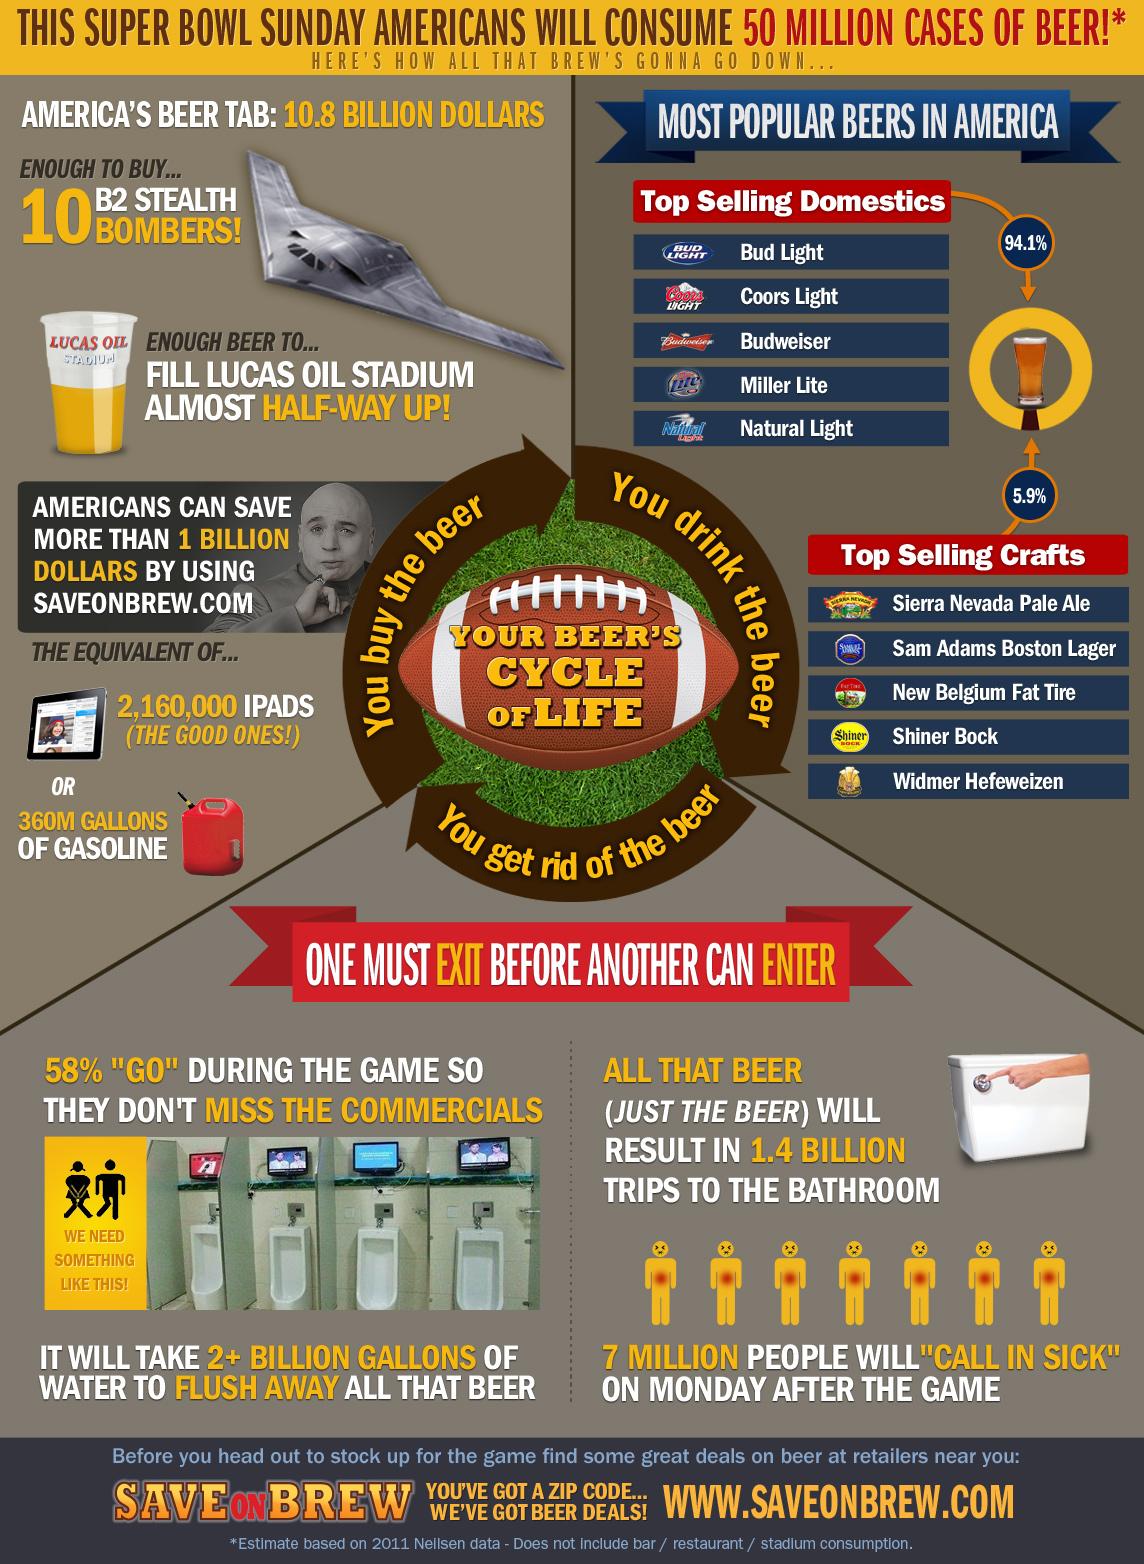 Owl Demotivational Poster Collection | Animal Photo |Funny Demotivational Posters Super Bowl Halftime